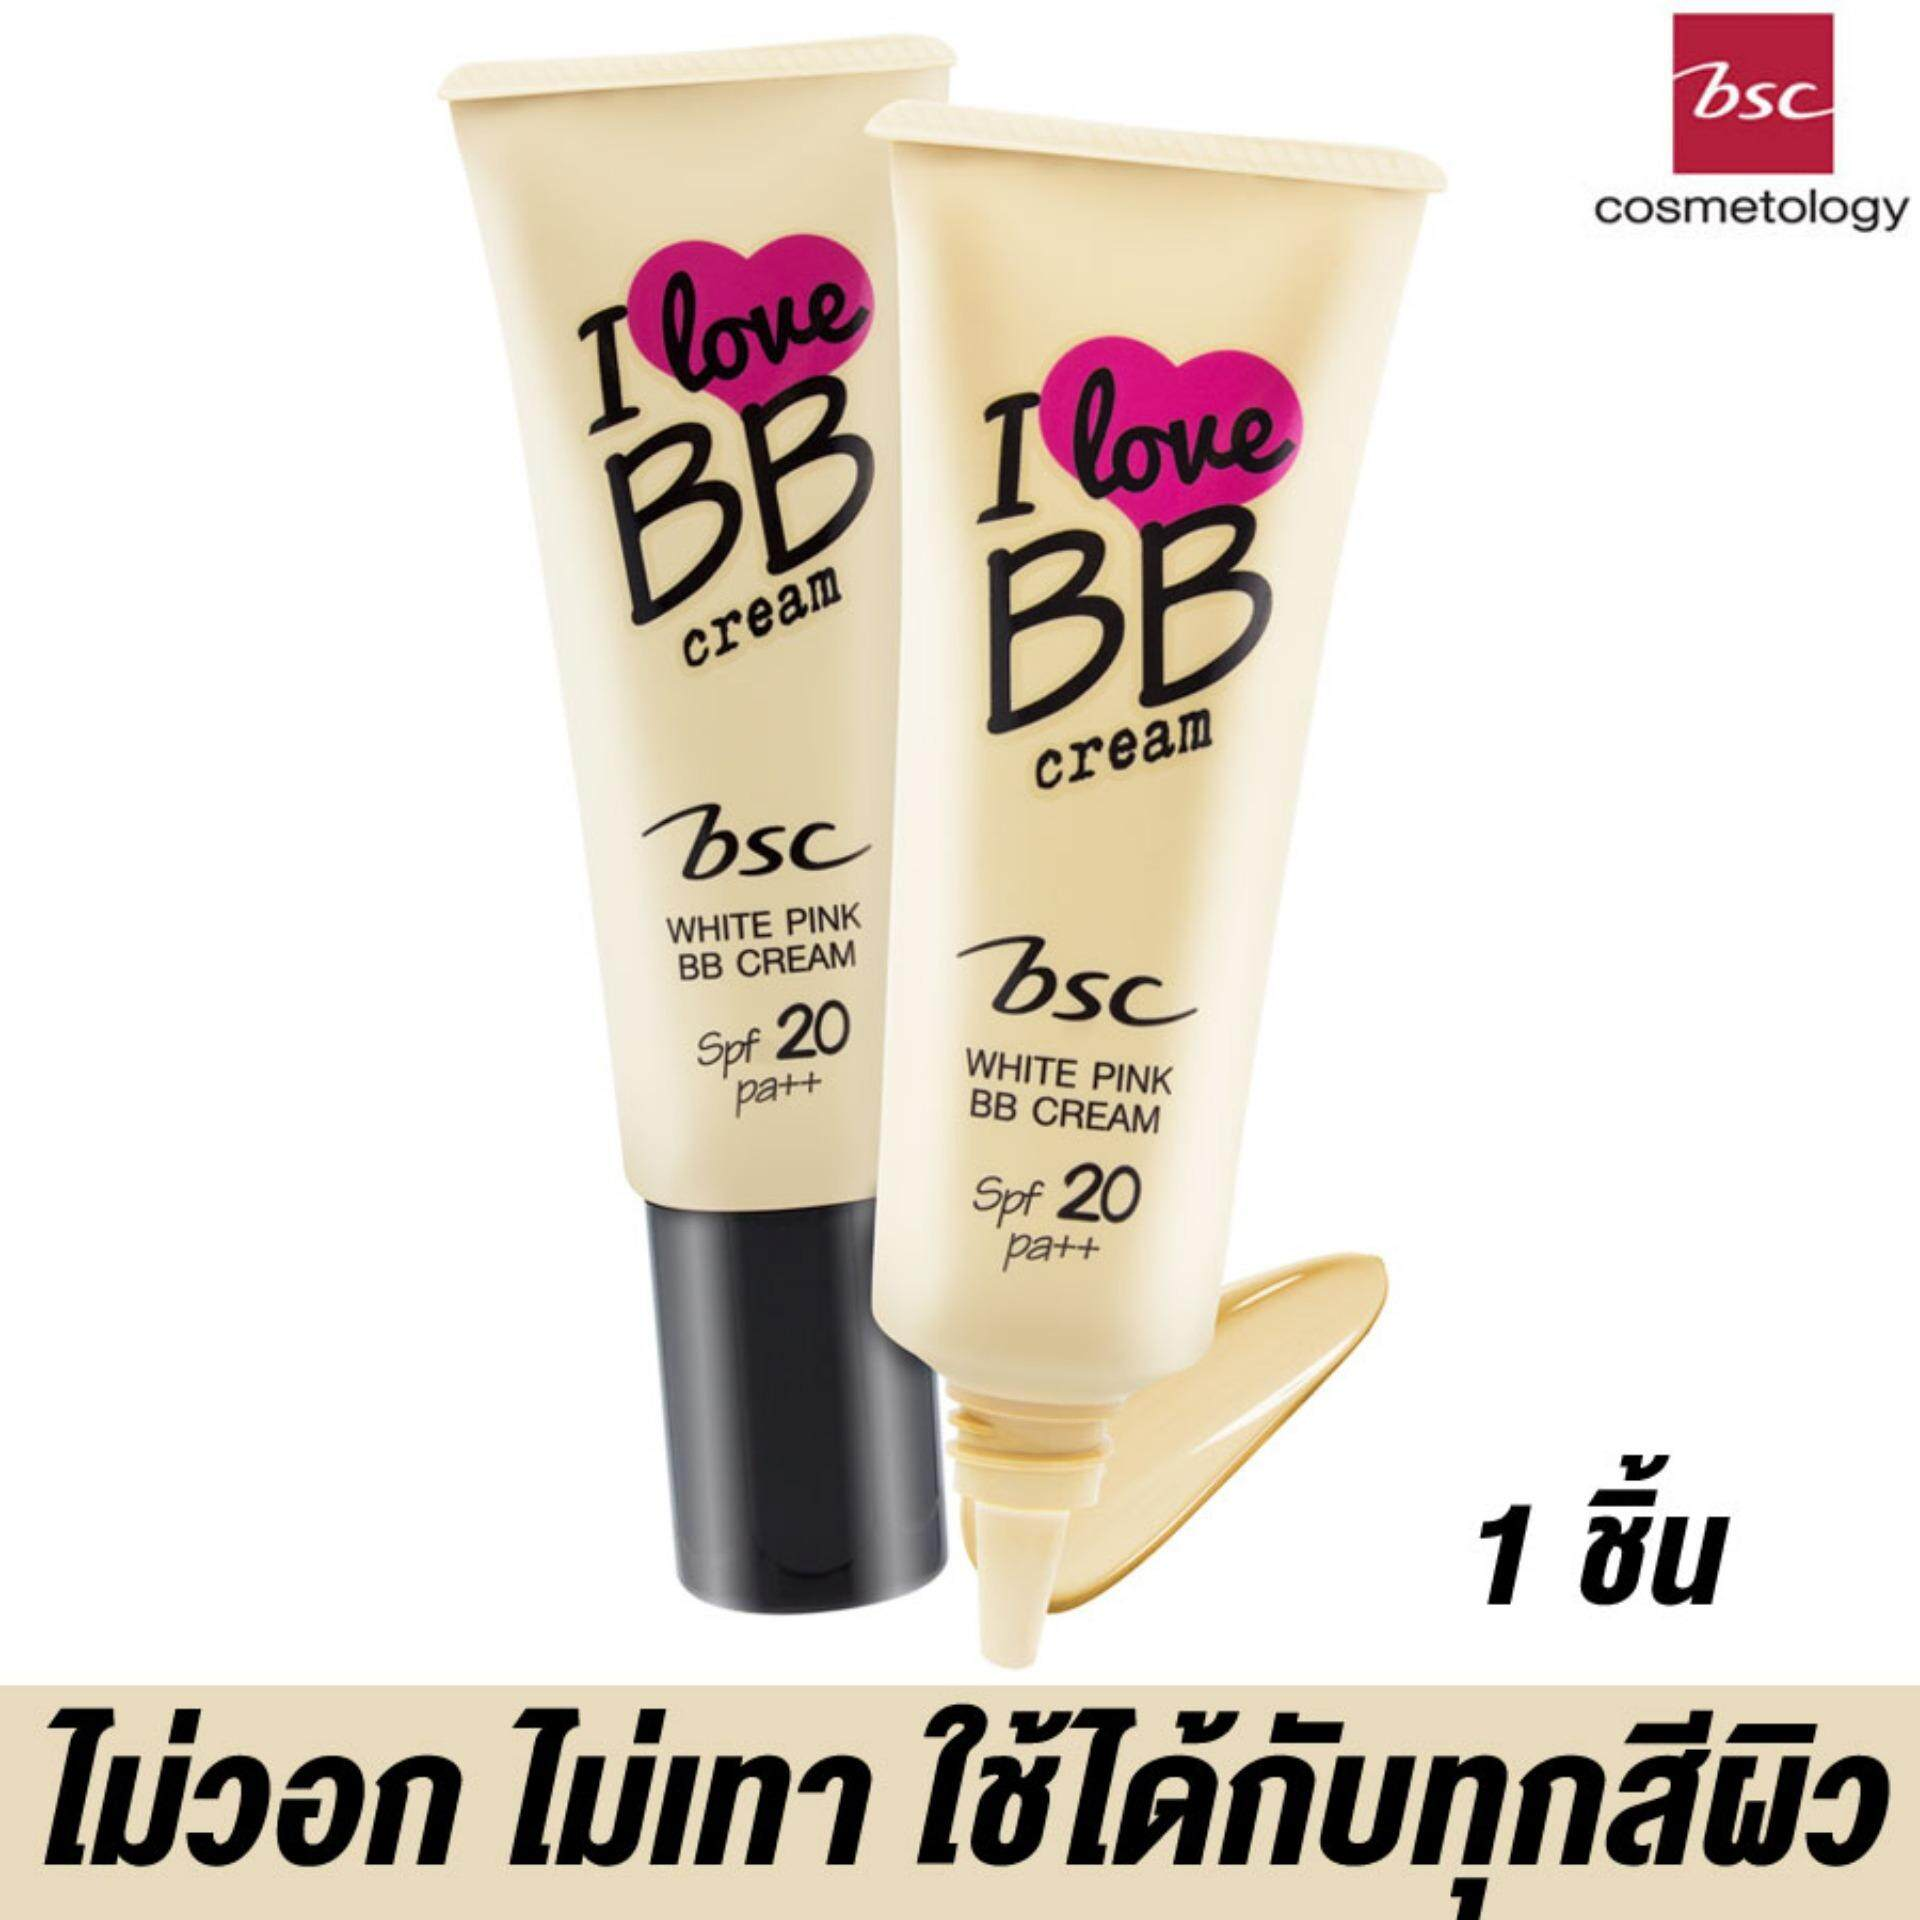 5000 Lazada Th Giordani Gold Cc Cream Spf 35 Bsc White Pink Bb 20 Pa 15